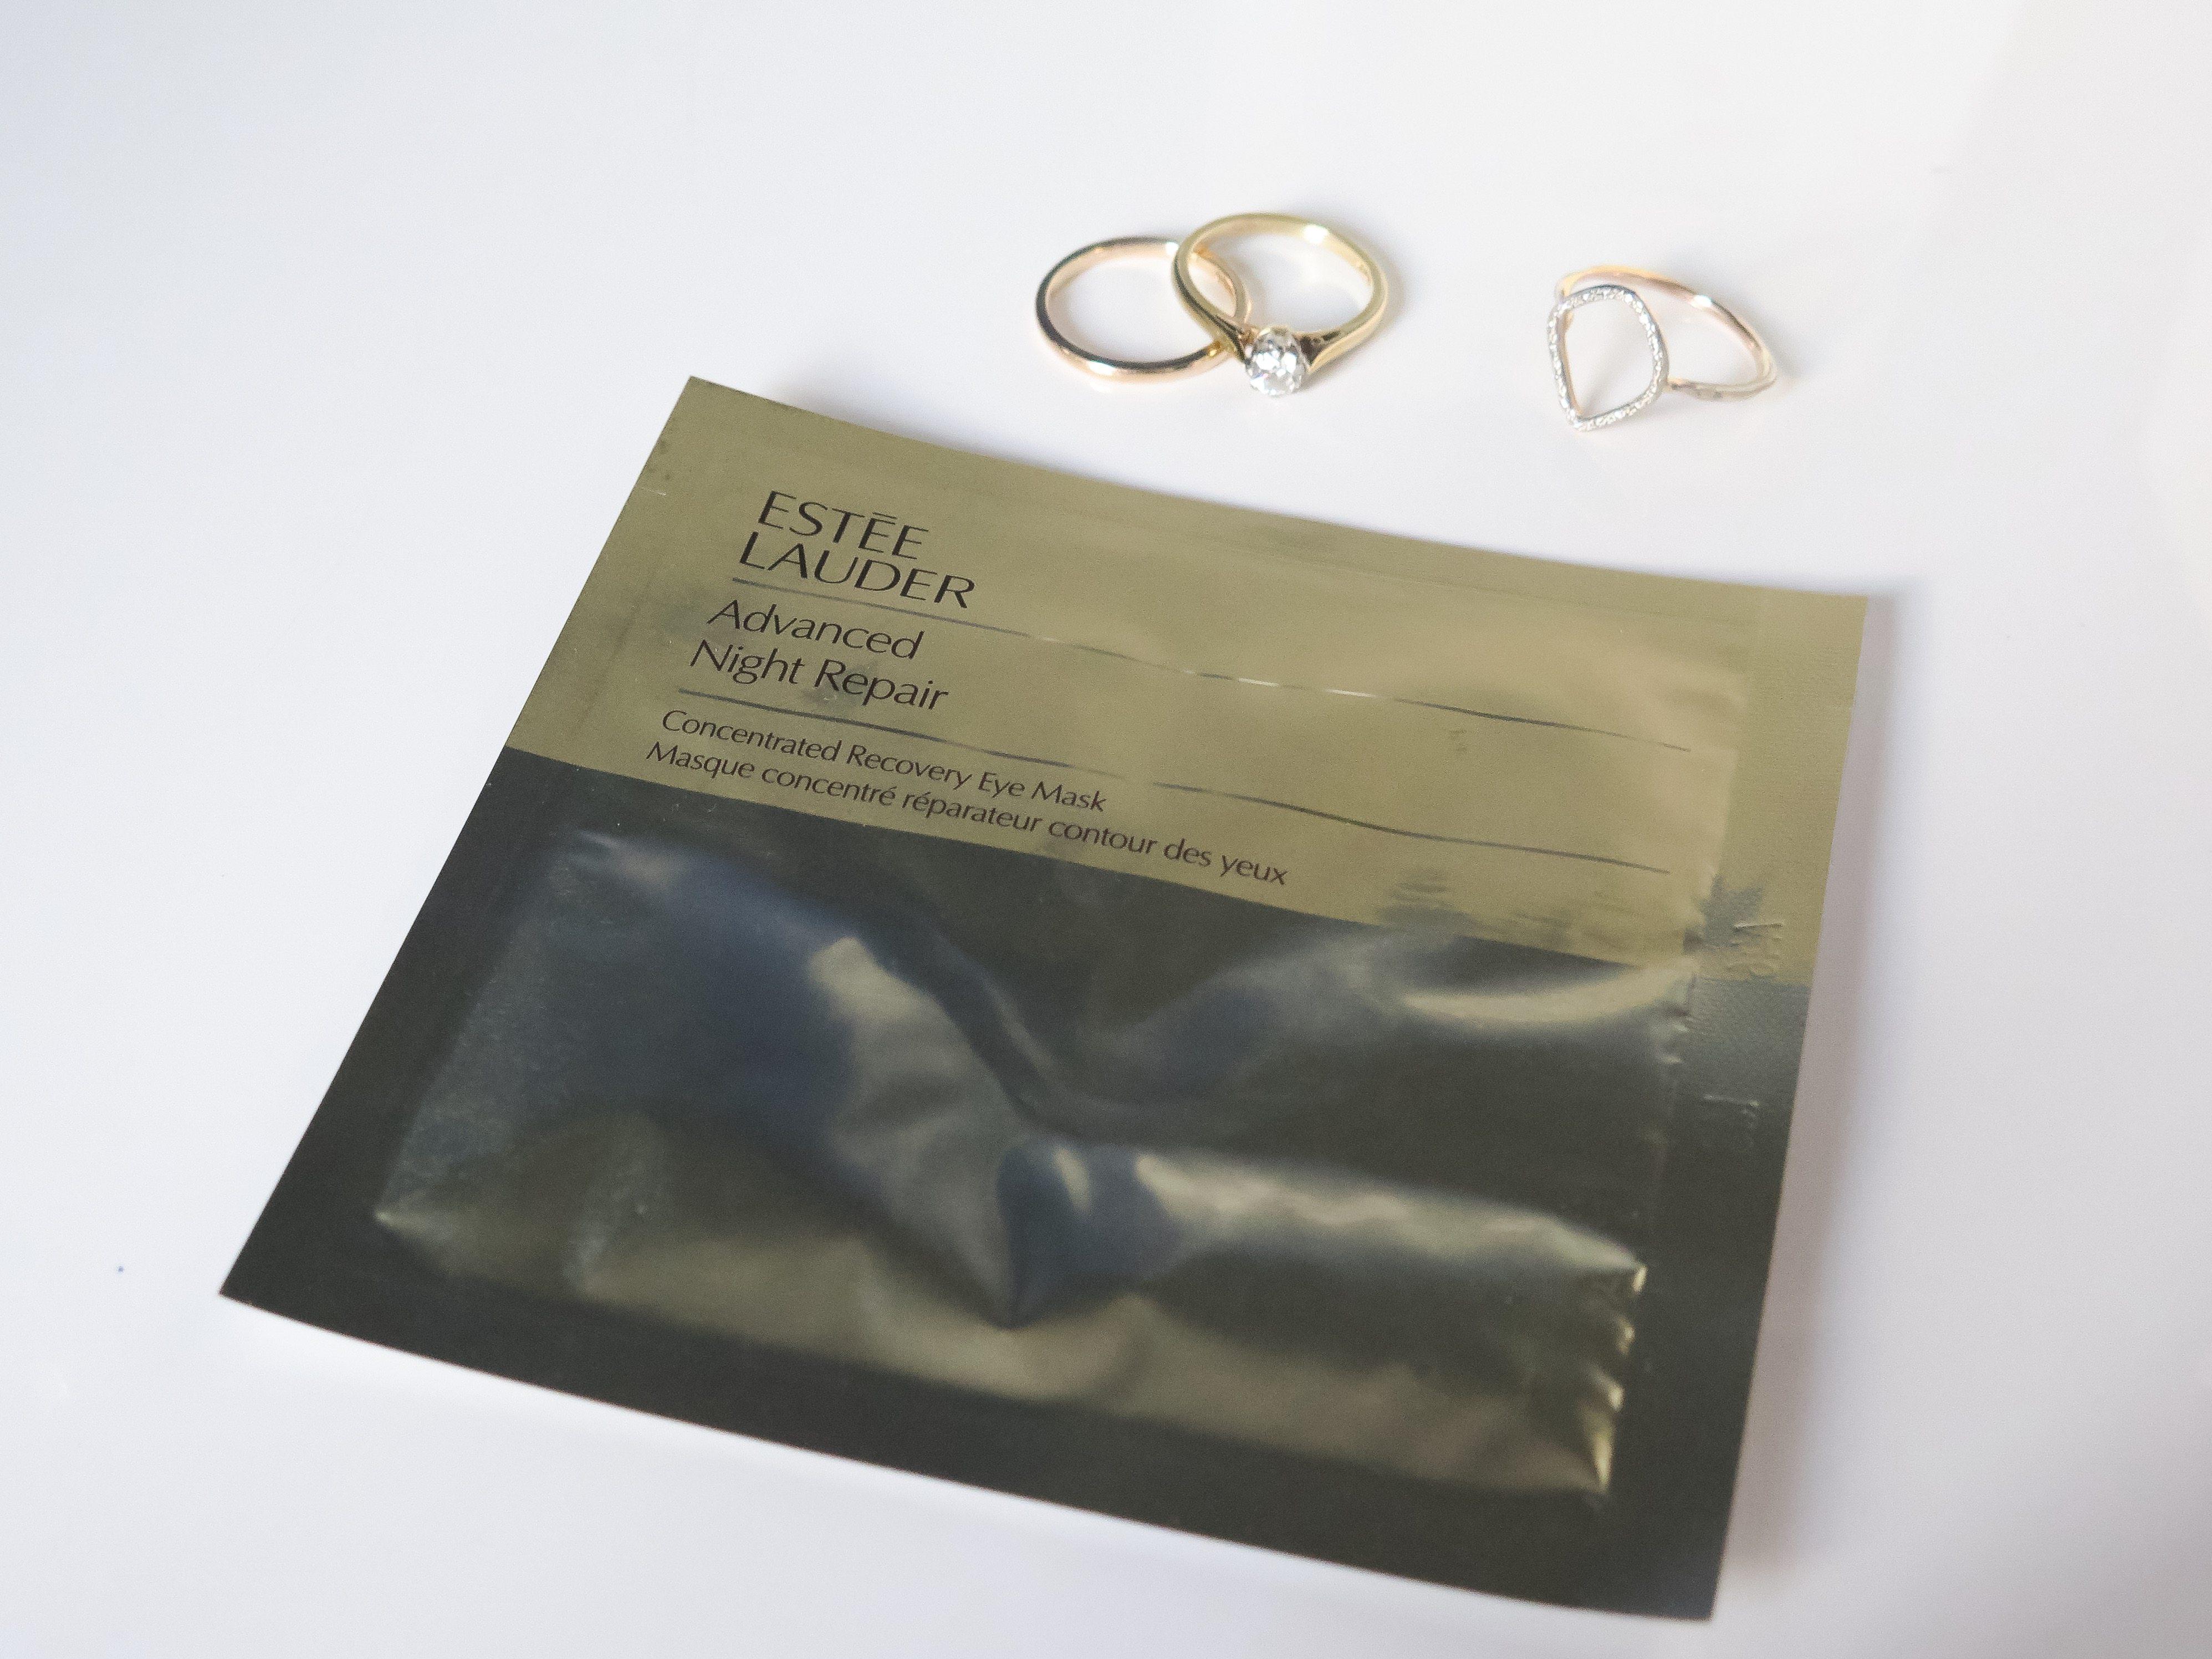 Estee Lauder Advanced Night Repair Eye Mask The Daydreamer